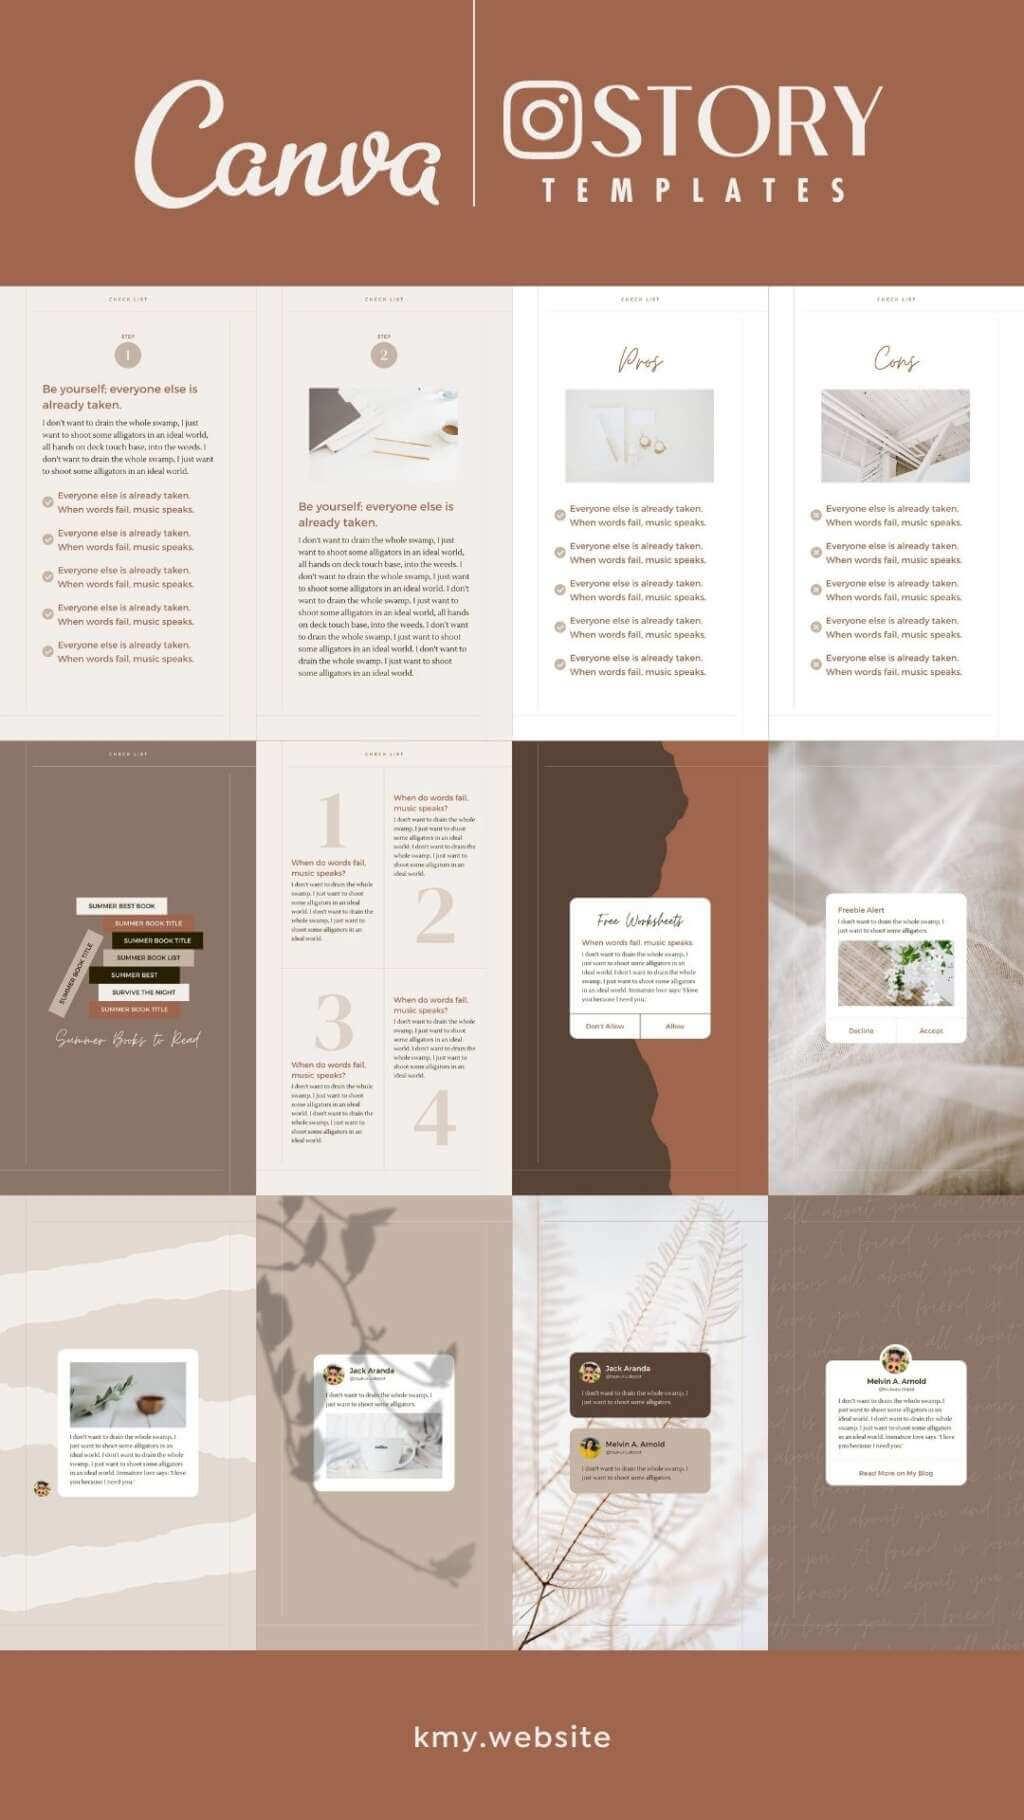 Instagram Story Reel Template Canva - Editable Clean Minimum Beige Brown Carousel IG Social Media Post Pack - Quotes, Notification, CTA